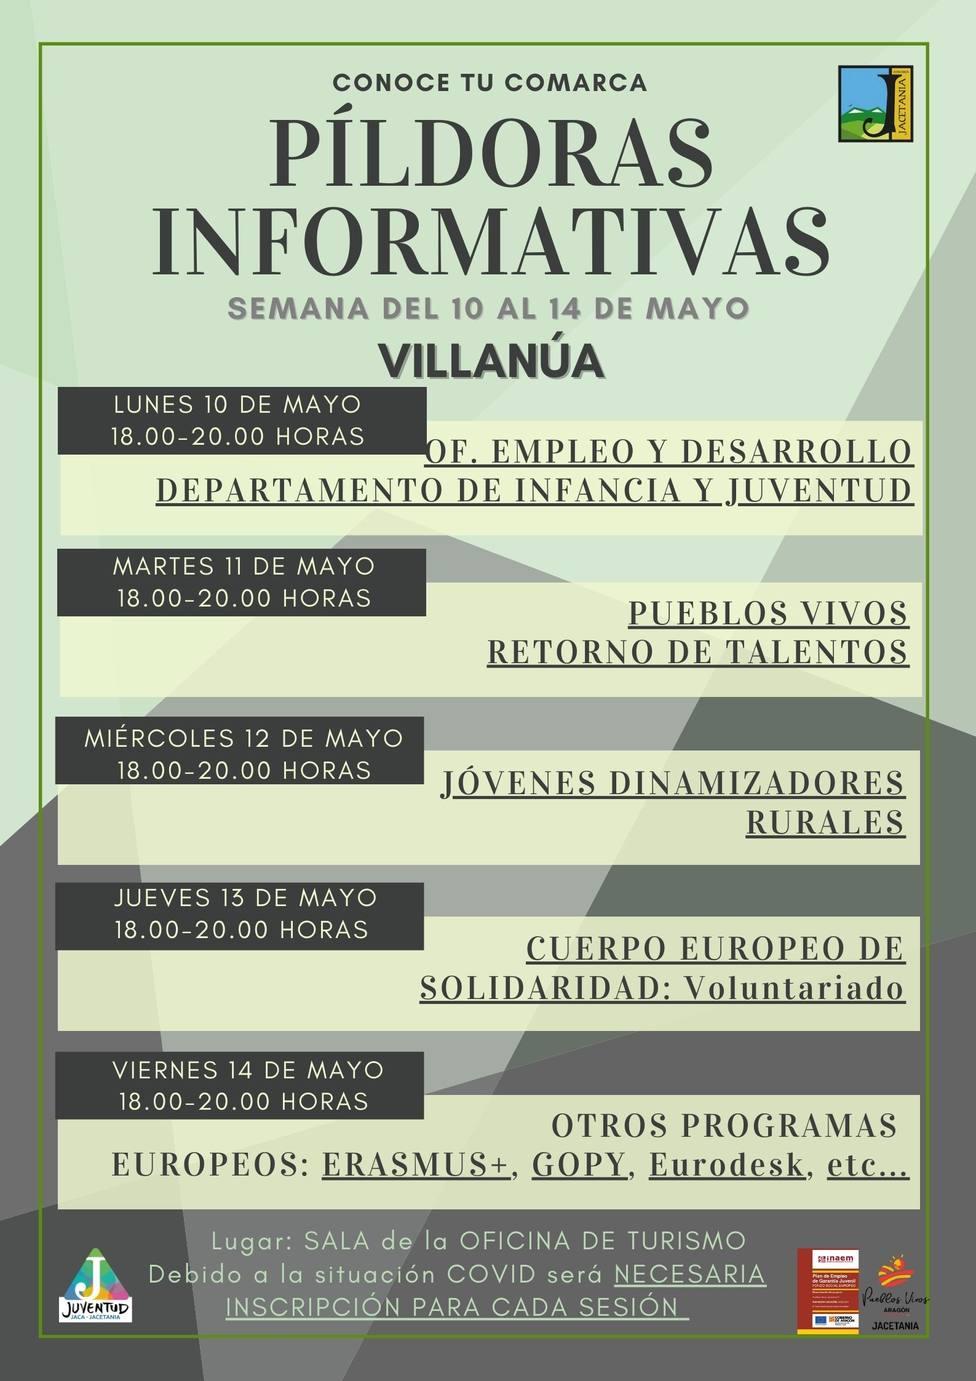 Píldoras informativas